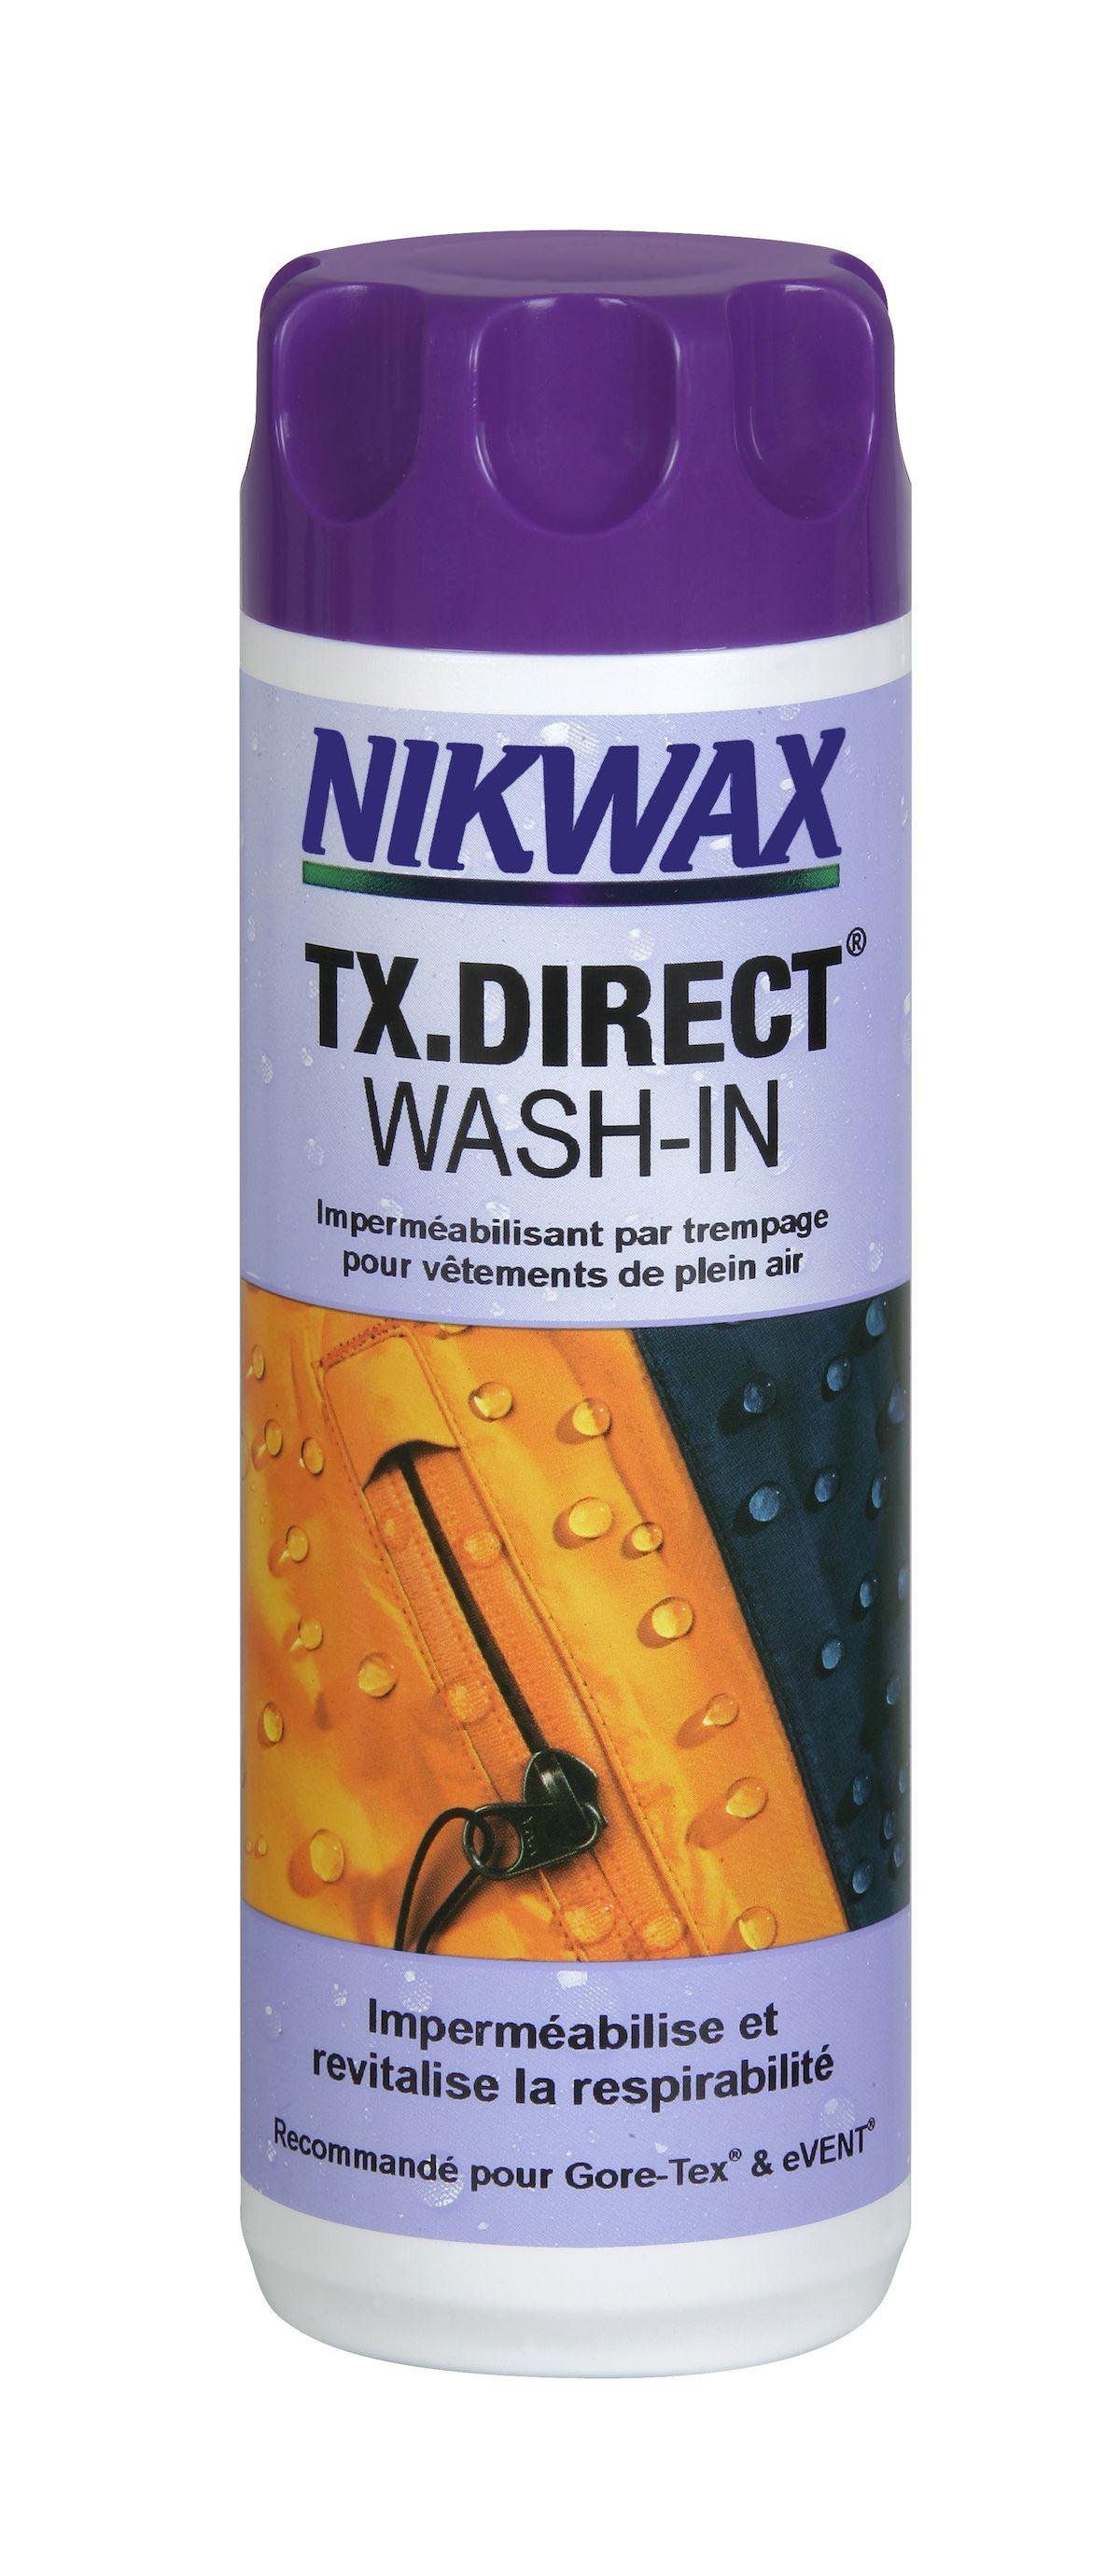 Nikwax - TX. Direct - Dry treatment